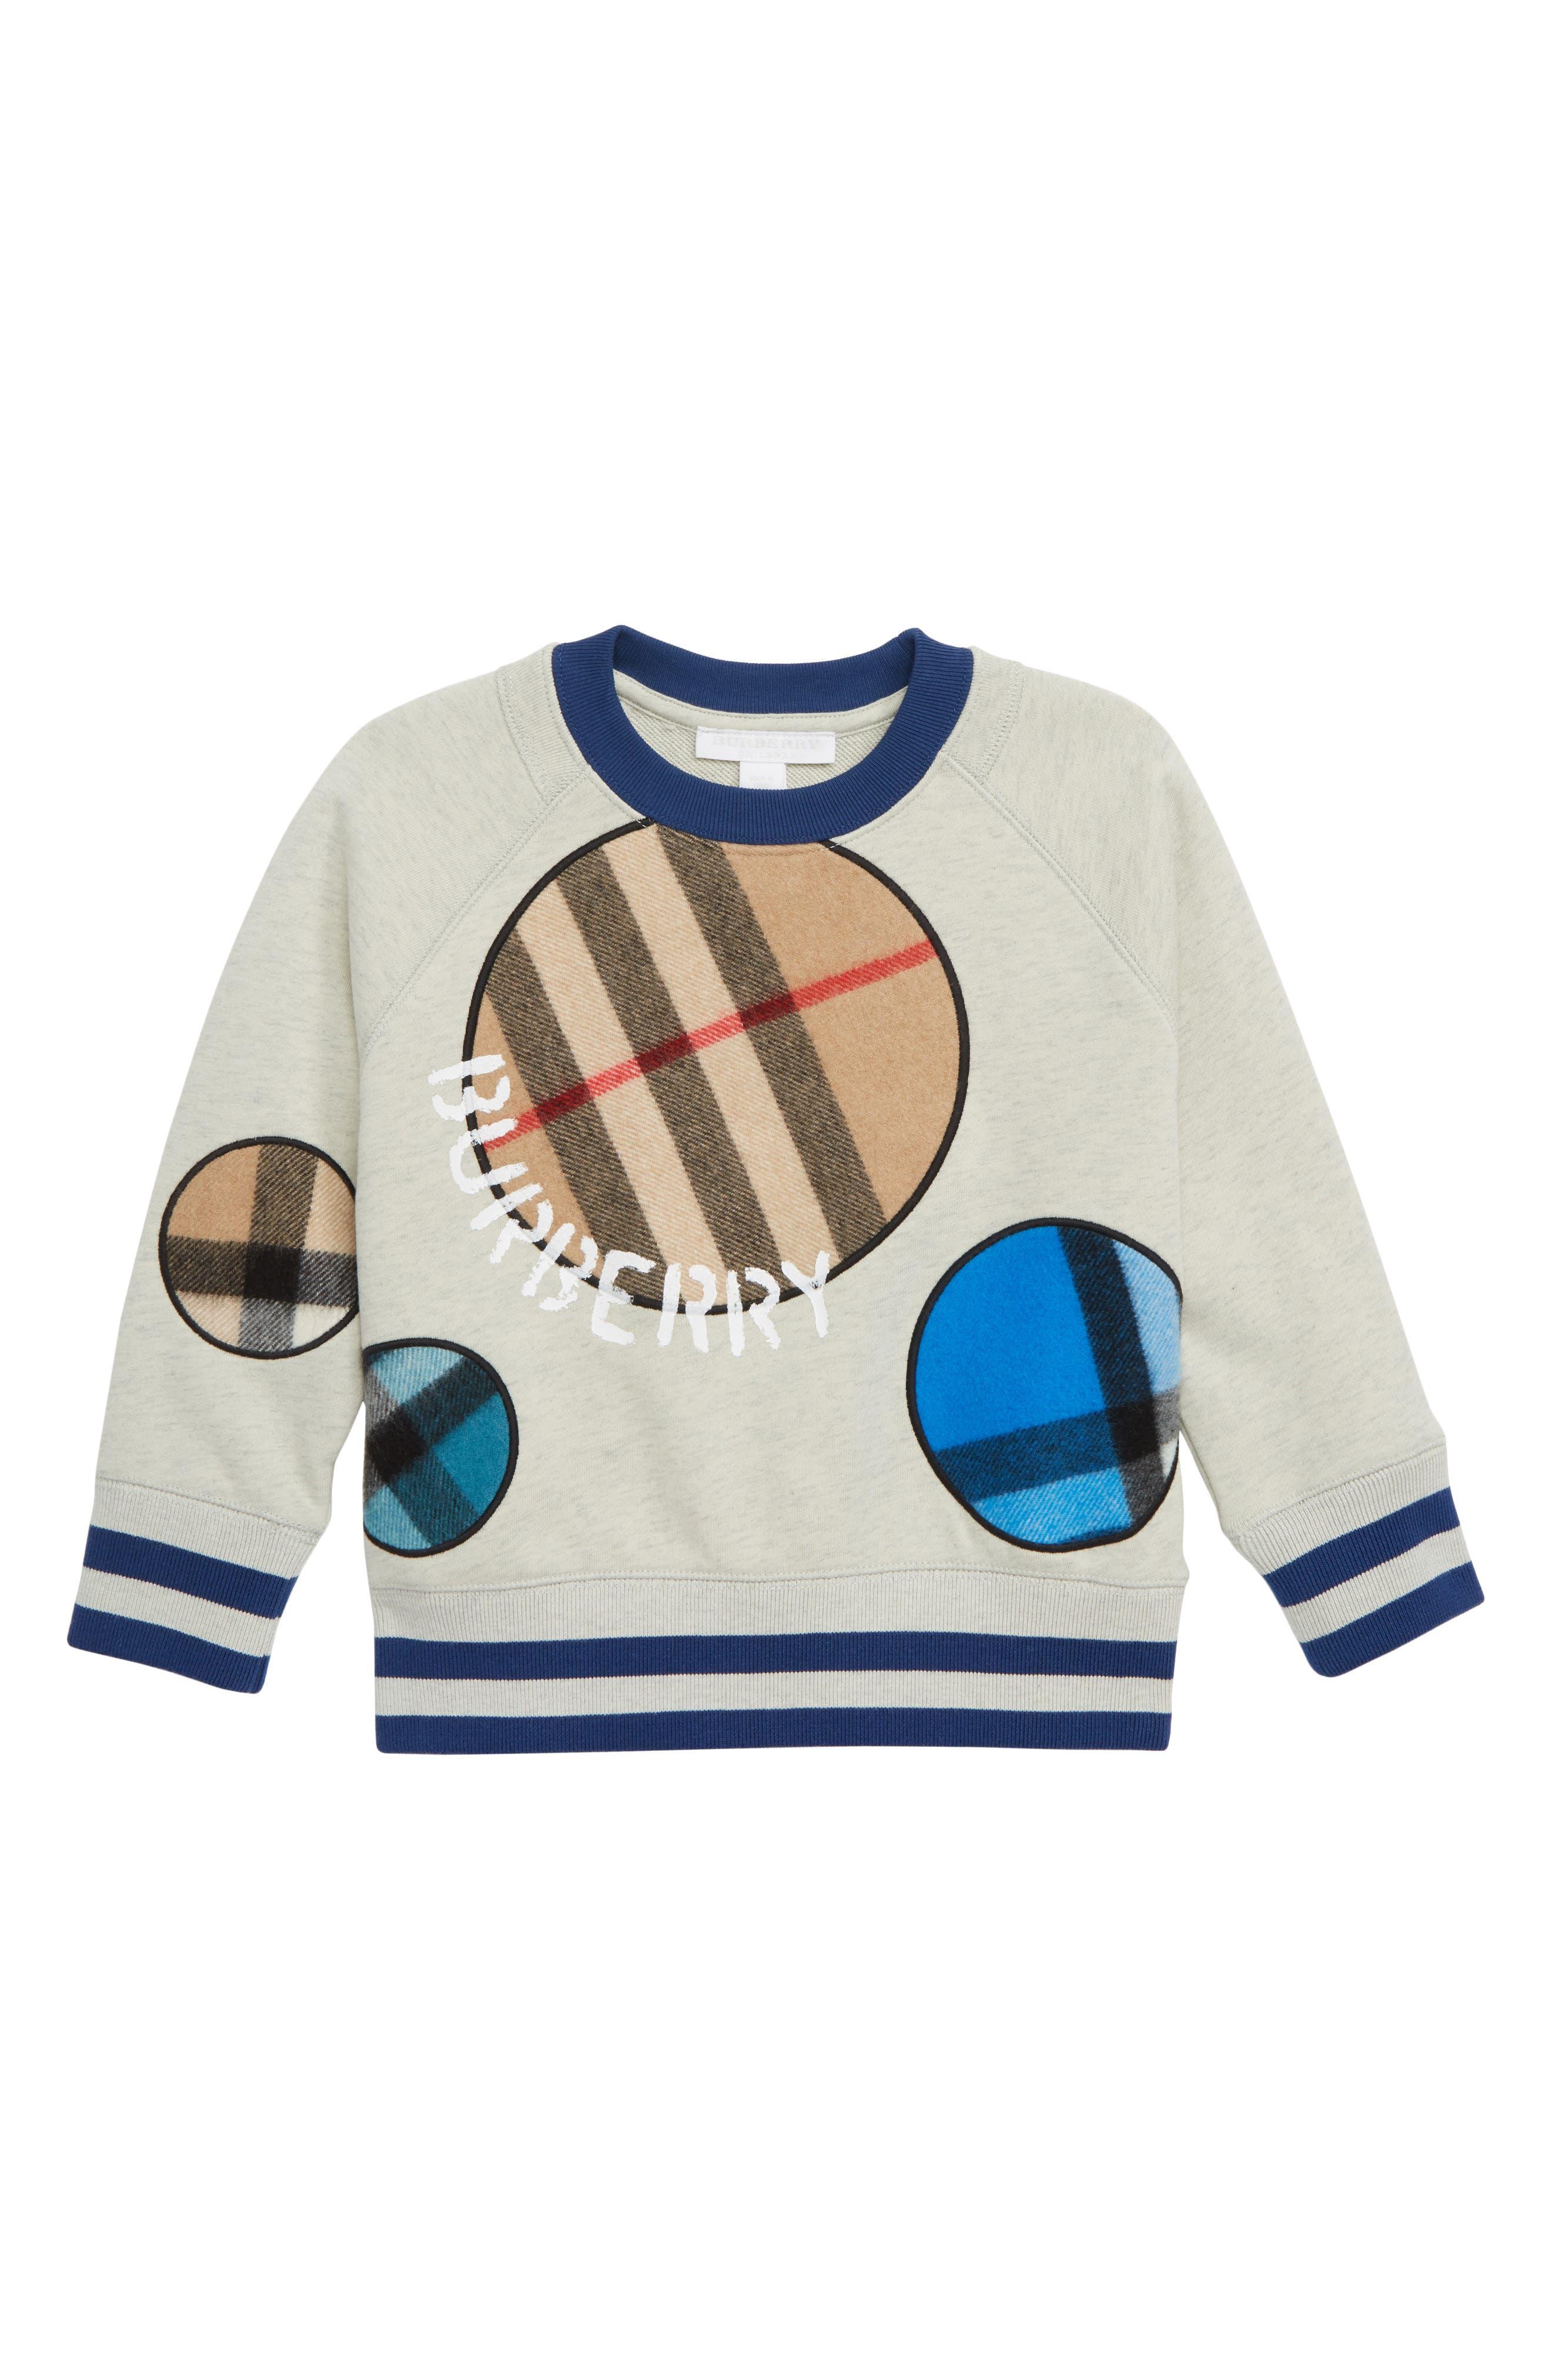 Toddler Boys Burberry Check Dots Sweatshirt Size 6Y  Beige